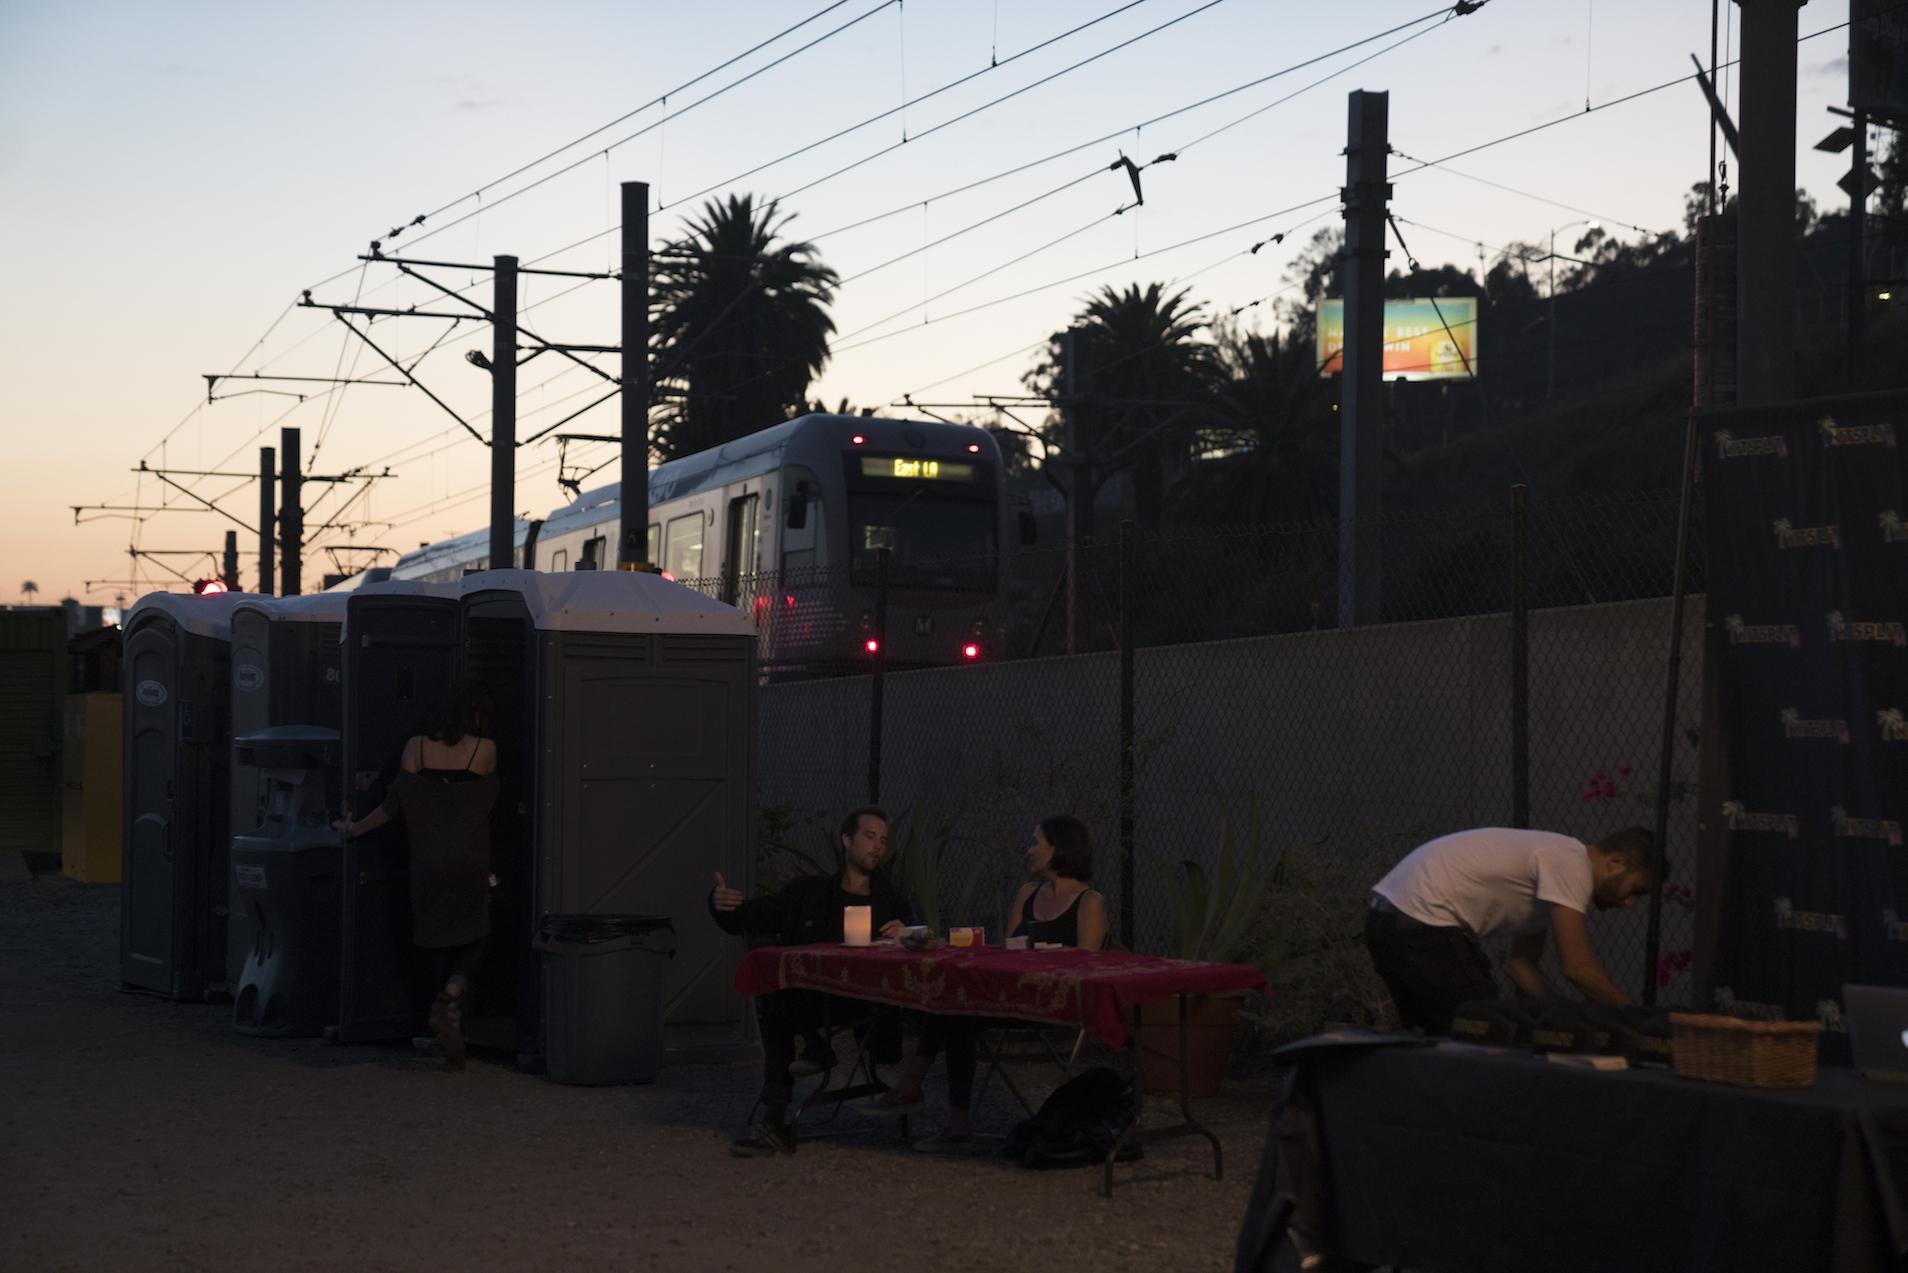 Sponsor tables and train 2 - moodier.jpeg